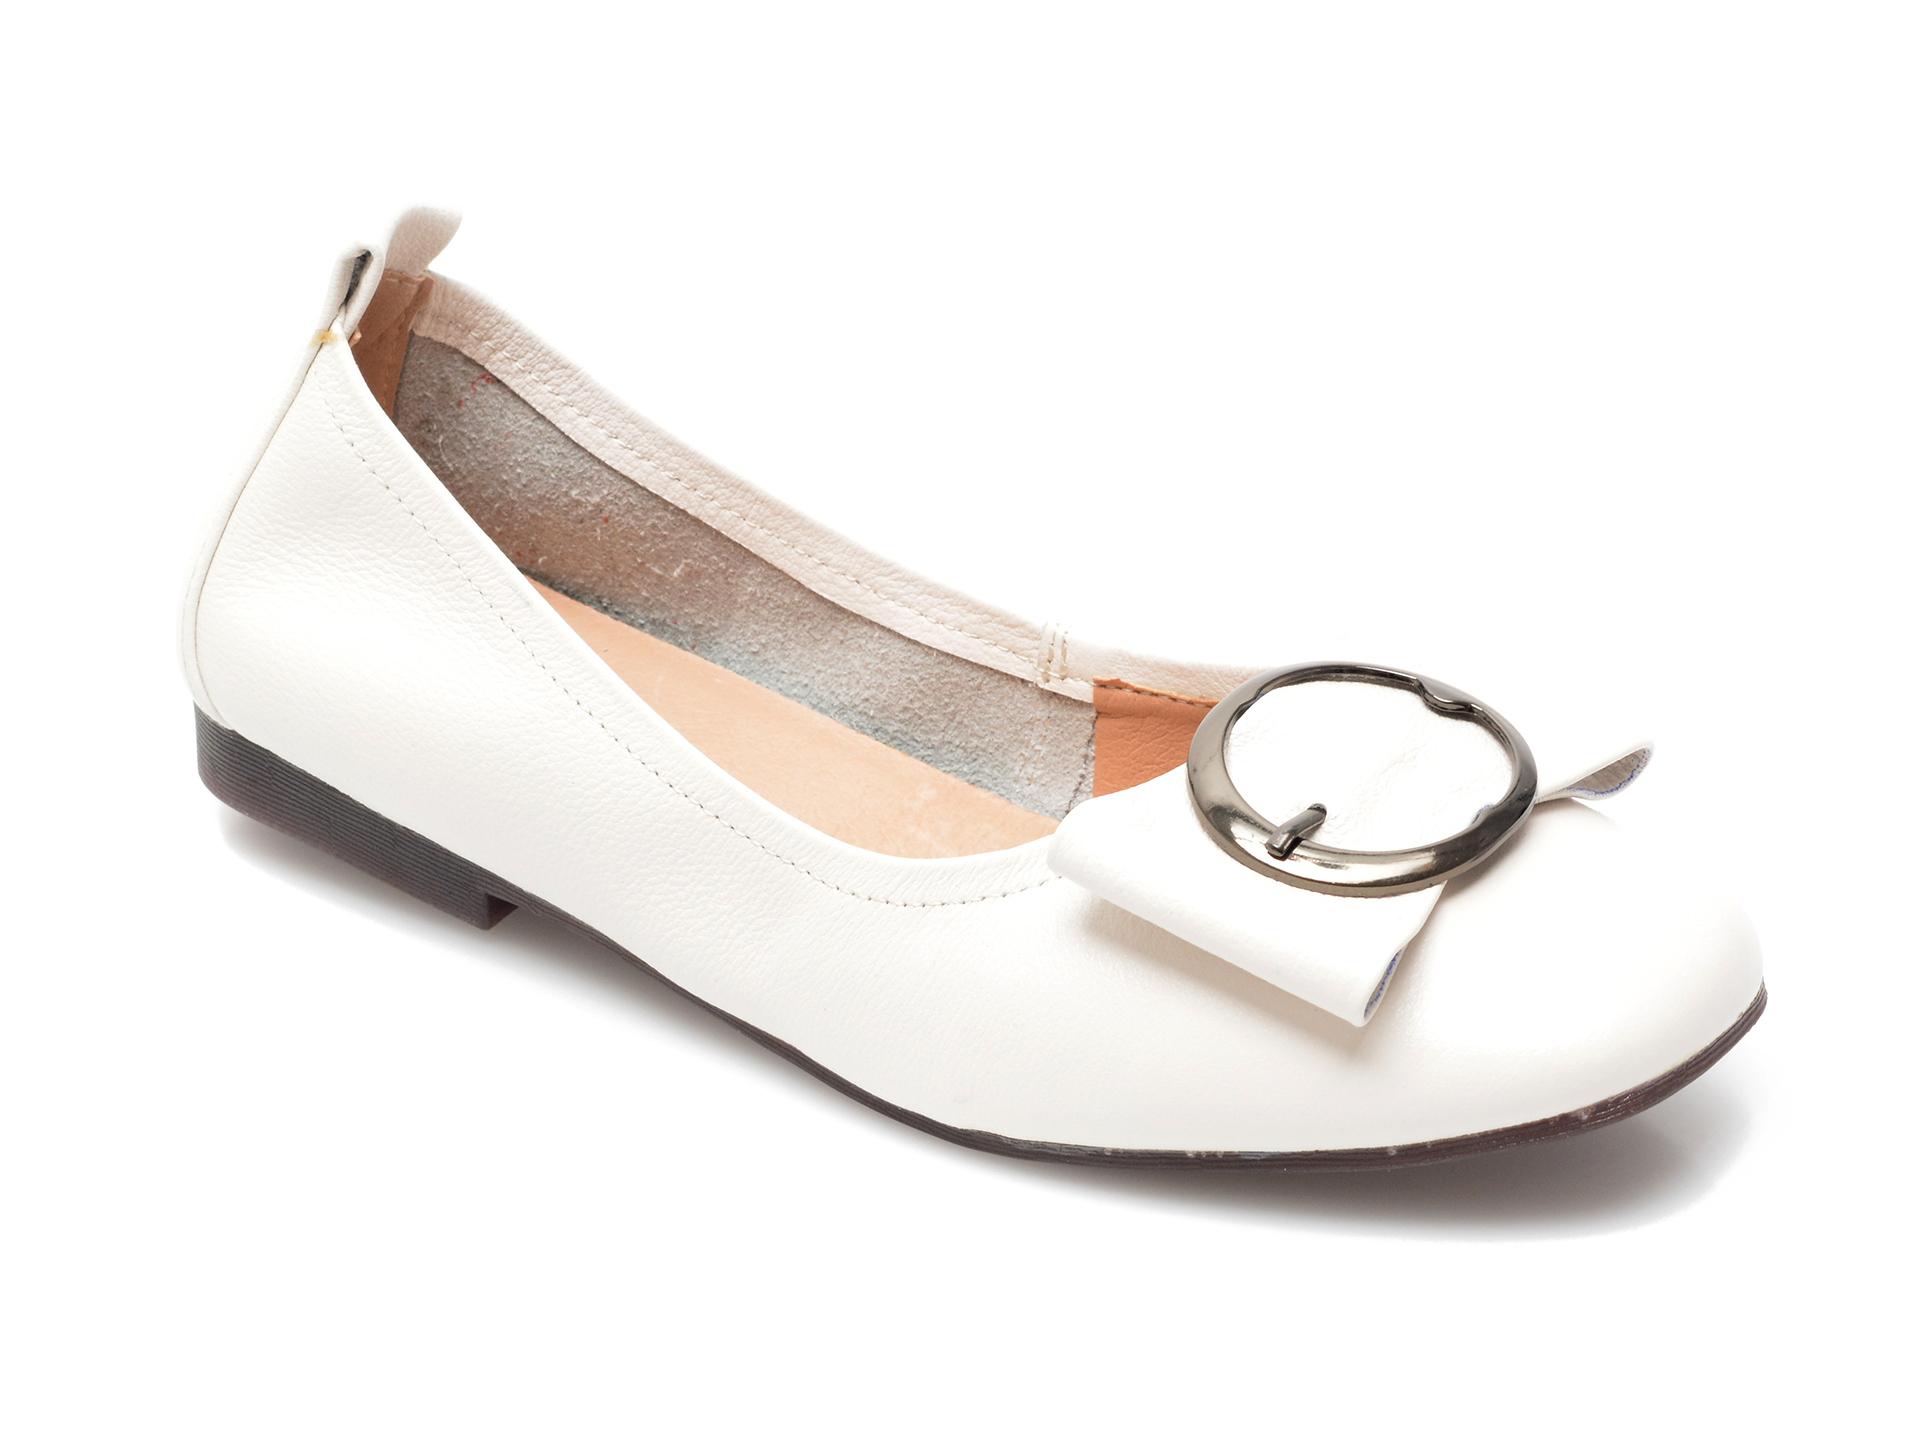 Balerini dama PASS COLLECTION, T2812, din piele naturala albi